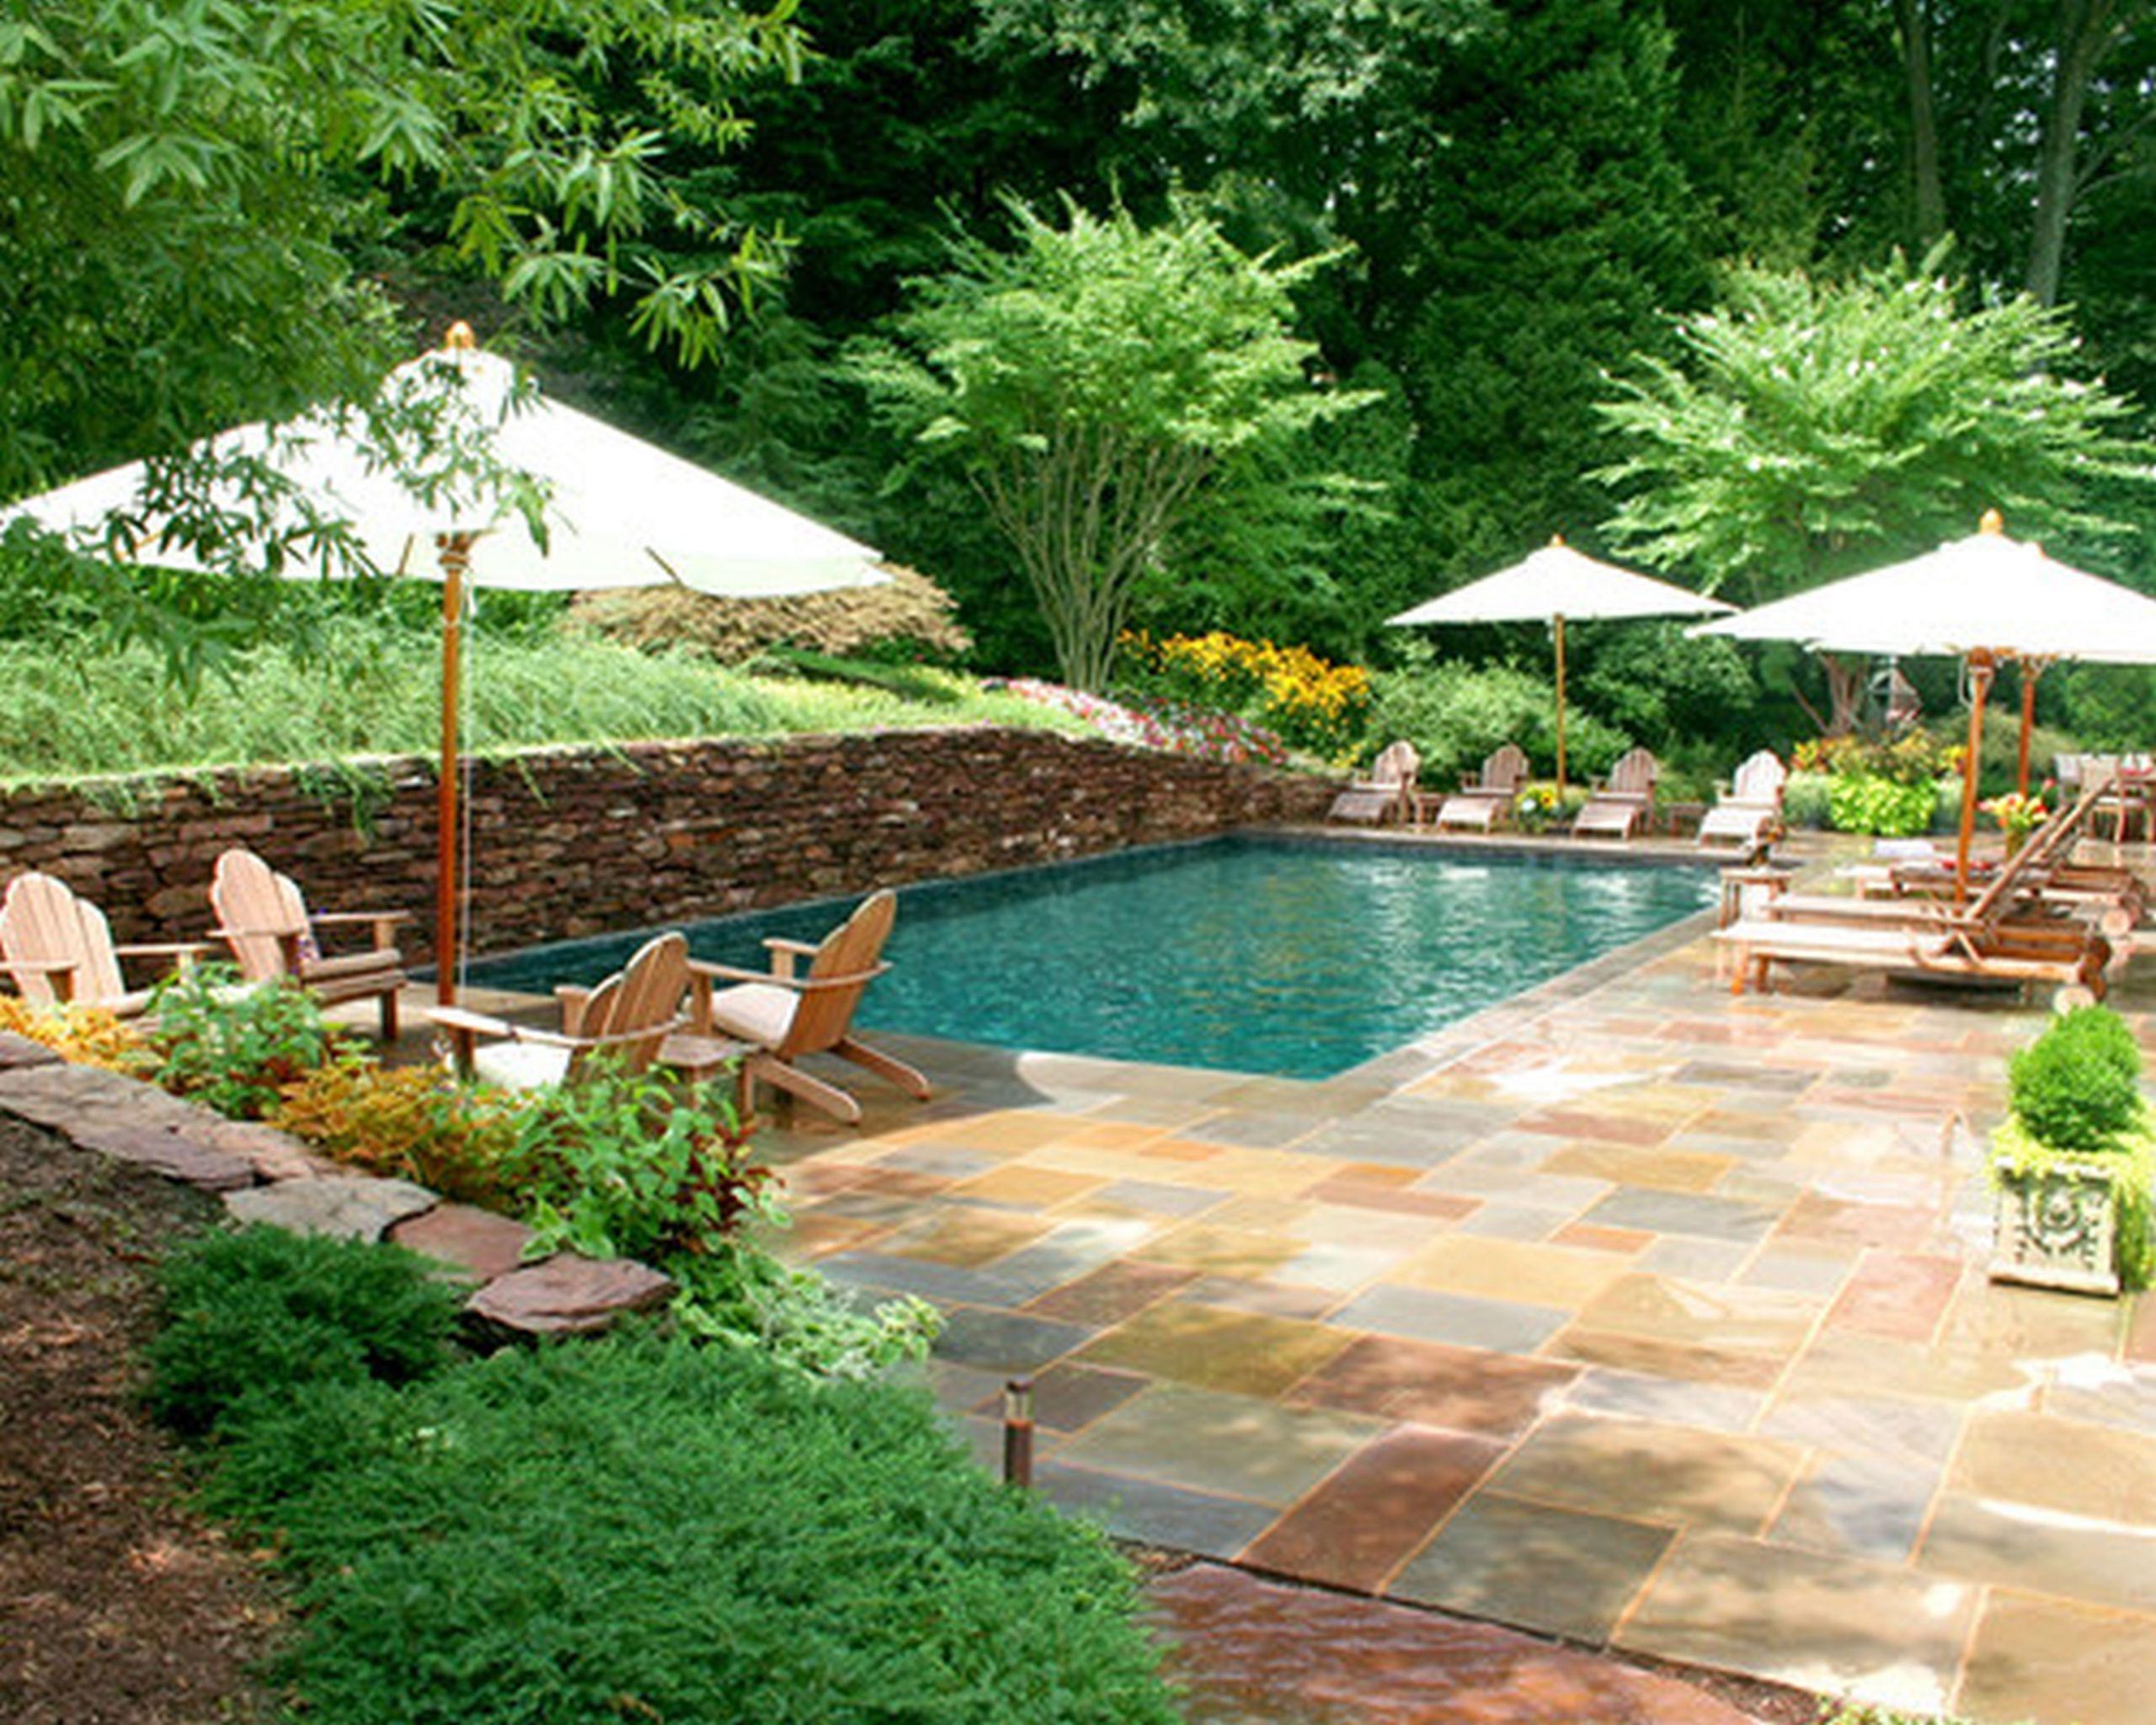 Pool Landscape Design  Designing Your Backyard Swimming Pool Part I of II